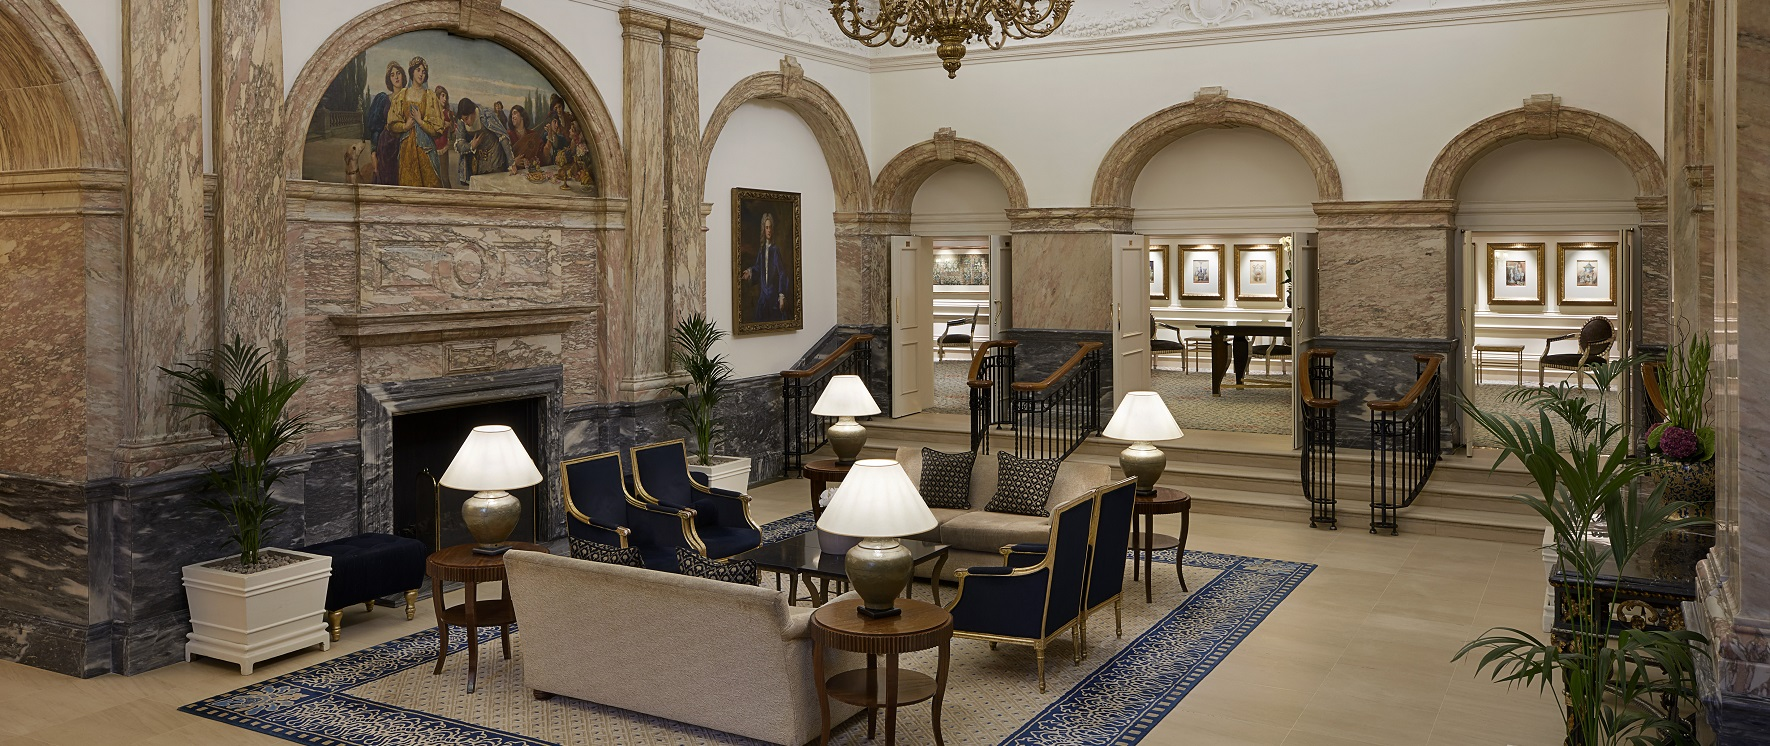 Marble-Hall-hotel-luxury-instagrammable-hidden-gem-historical-slide.jpg